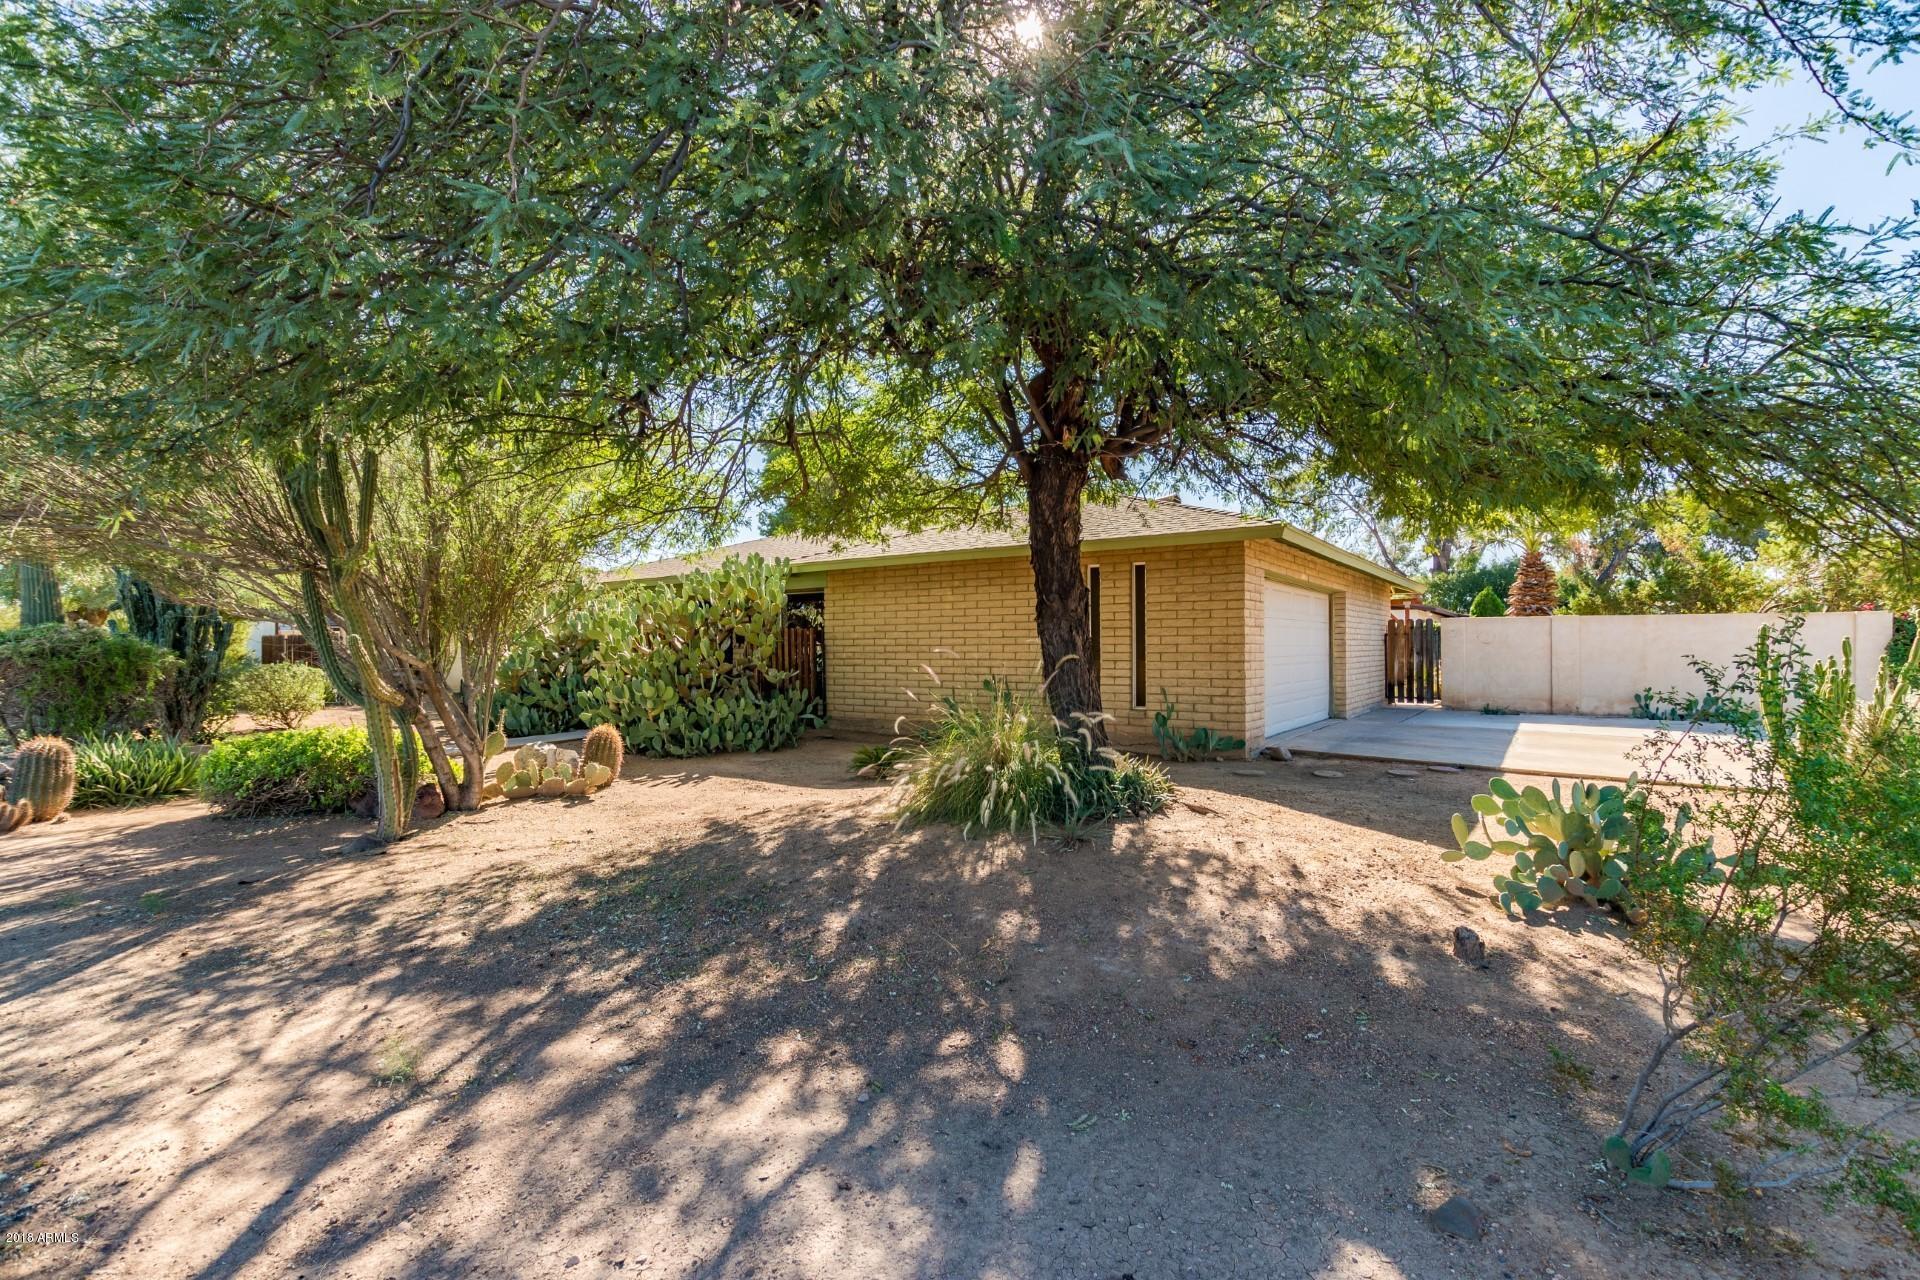 Photo of 303 W ORCHID Lane, Chandler, AZ 85225